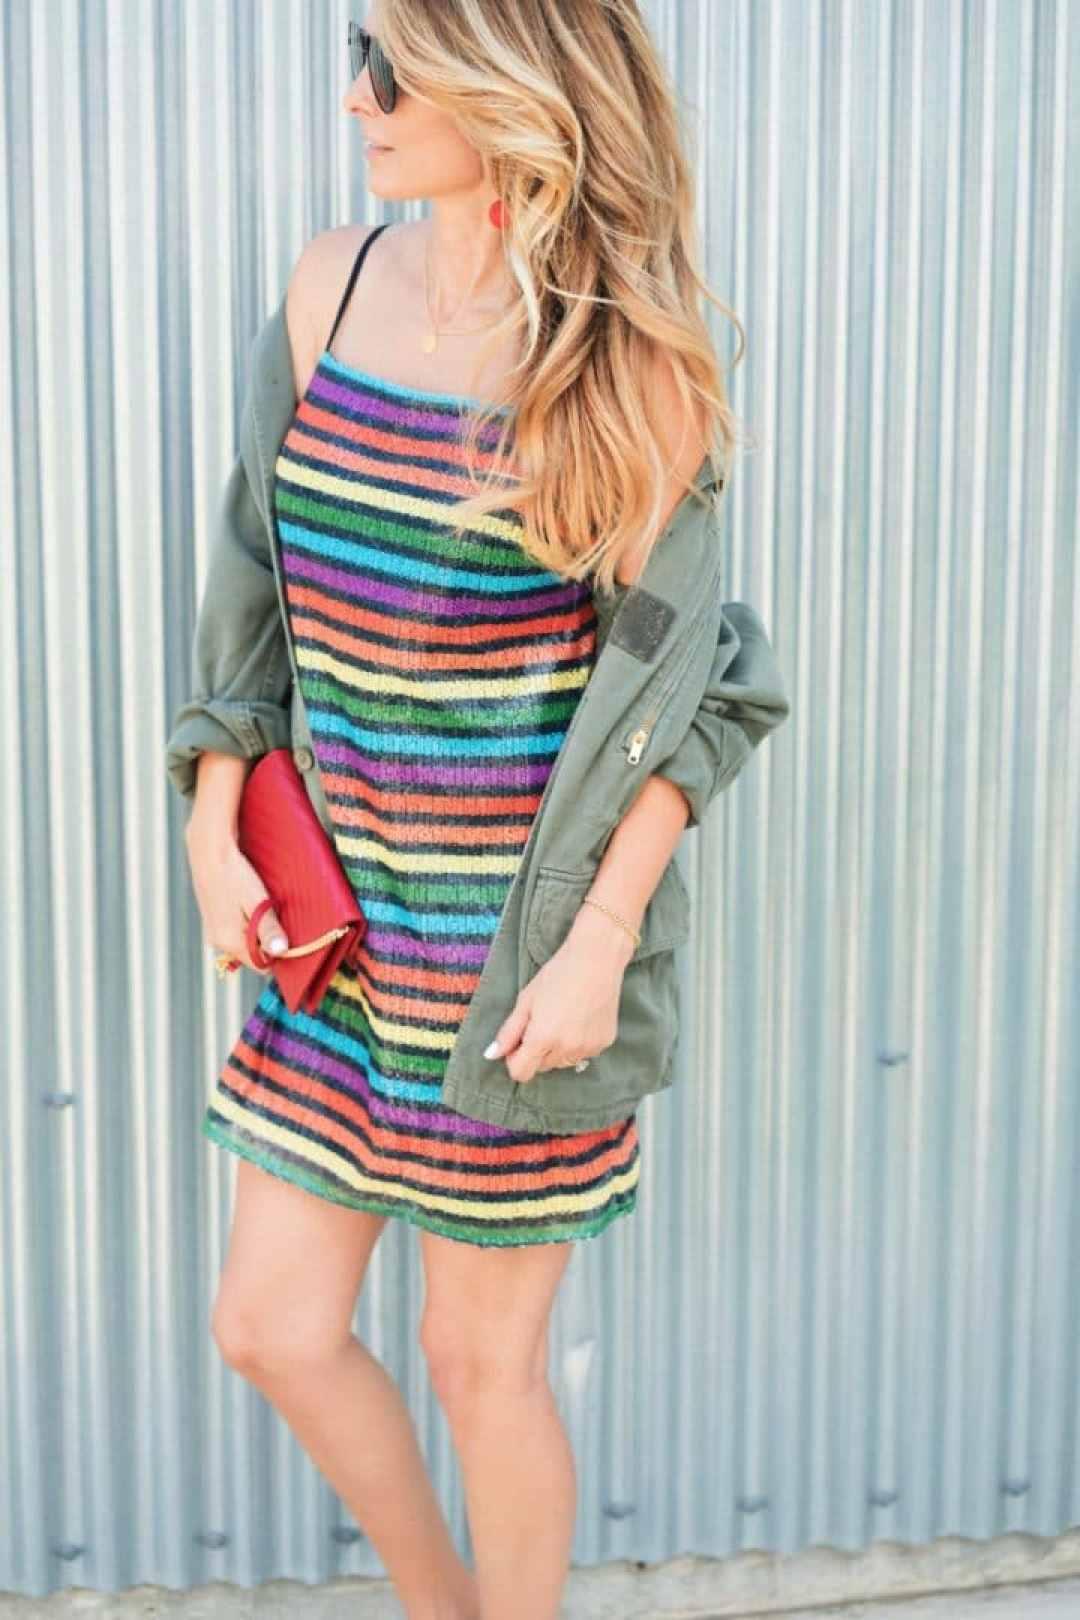 Rainbow Print Sequin Slip Dress Style